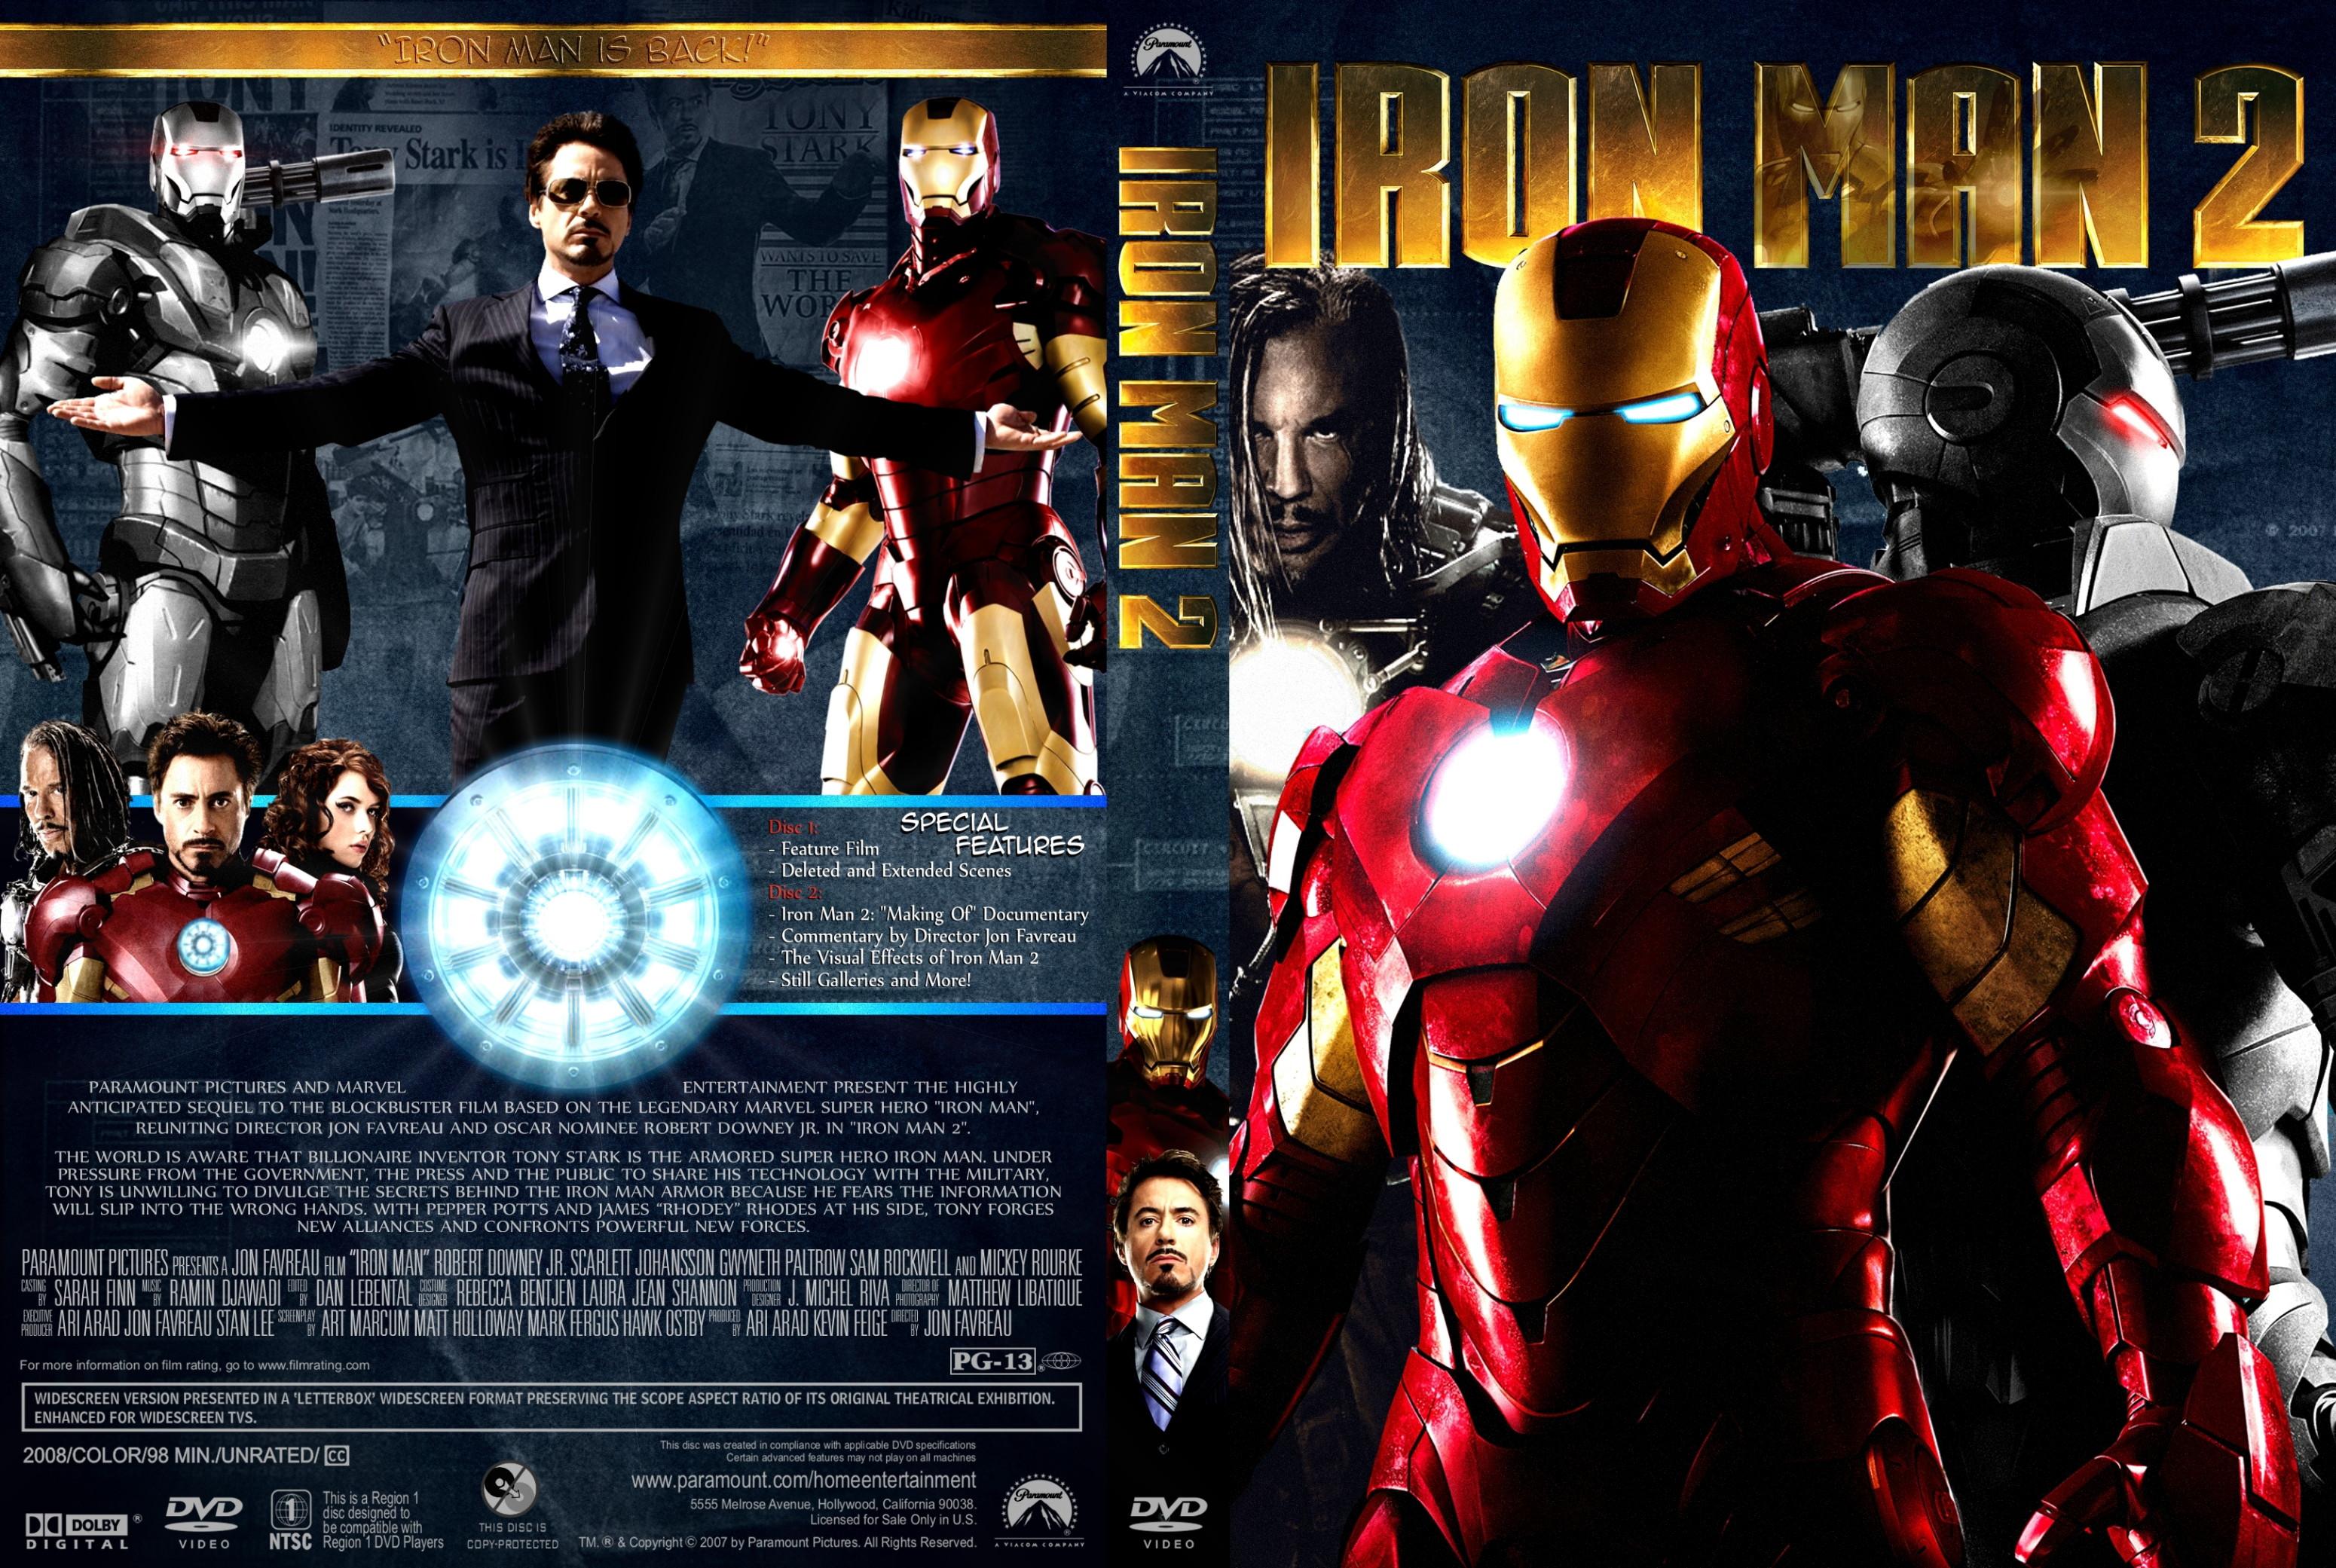 Covers Box Sk Iron Man 2 2010 High Quality Dvd